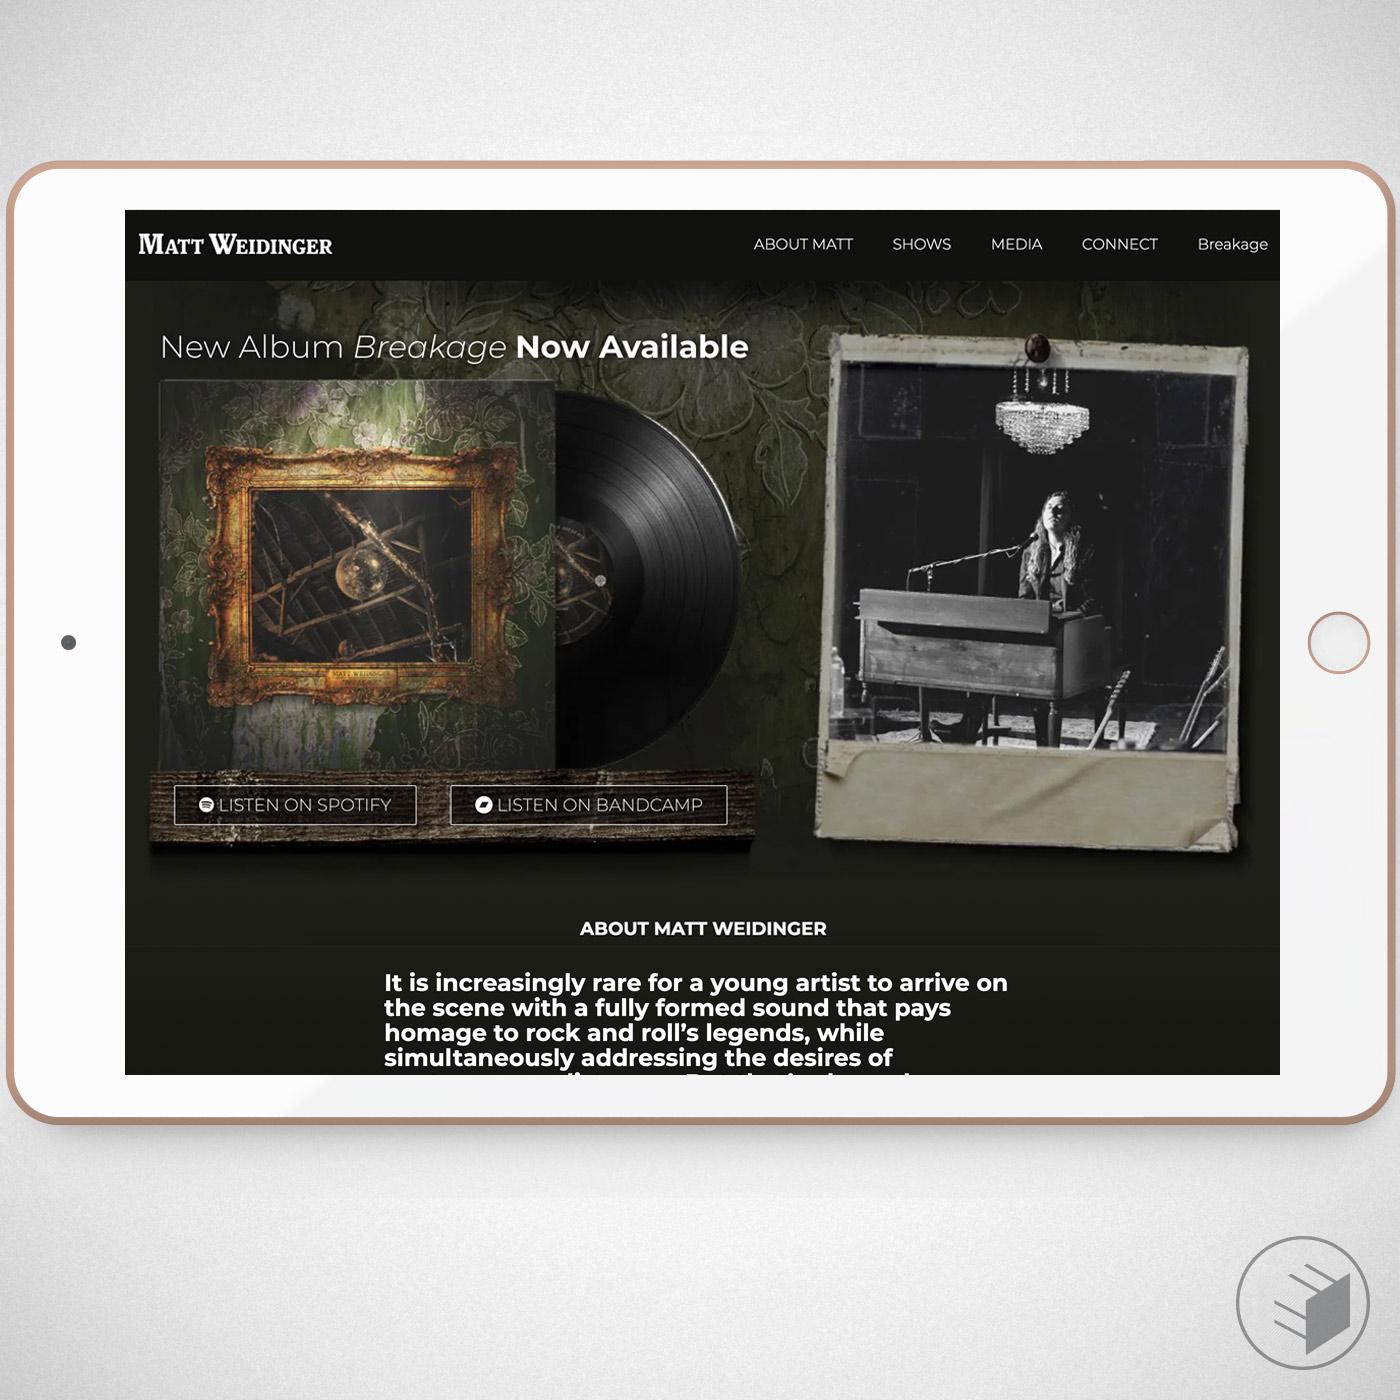 MATT WEIDINGER WEBSITE & ALBUM COVER